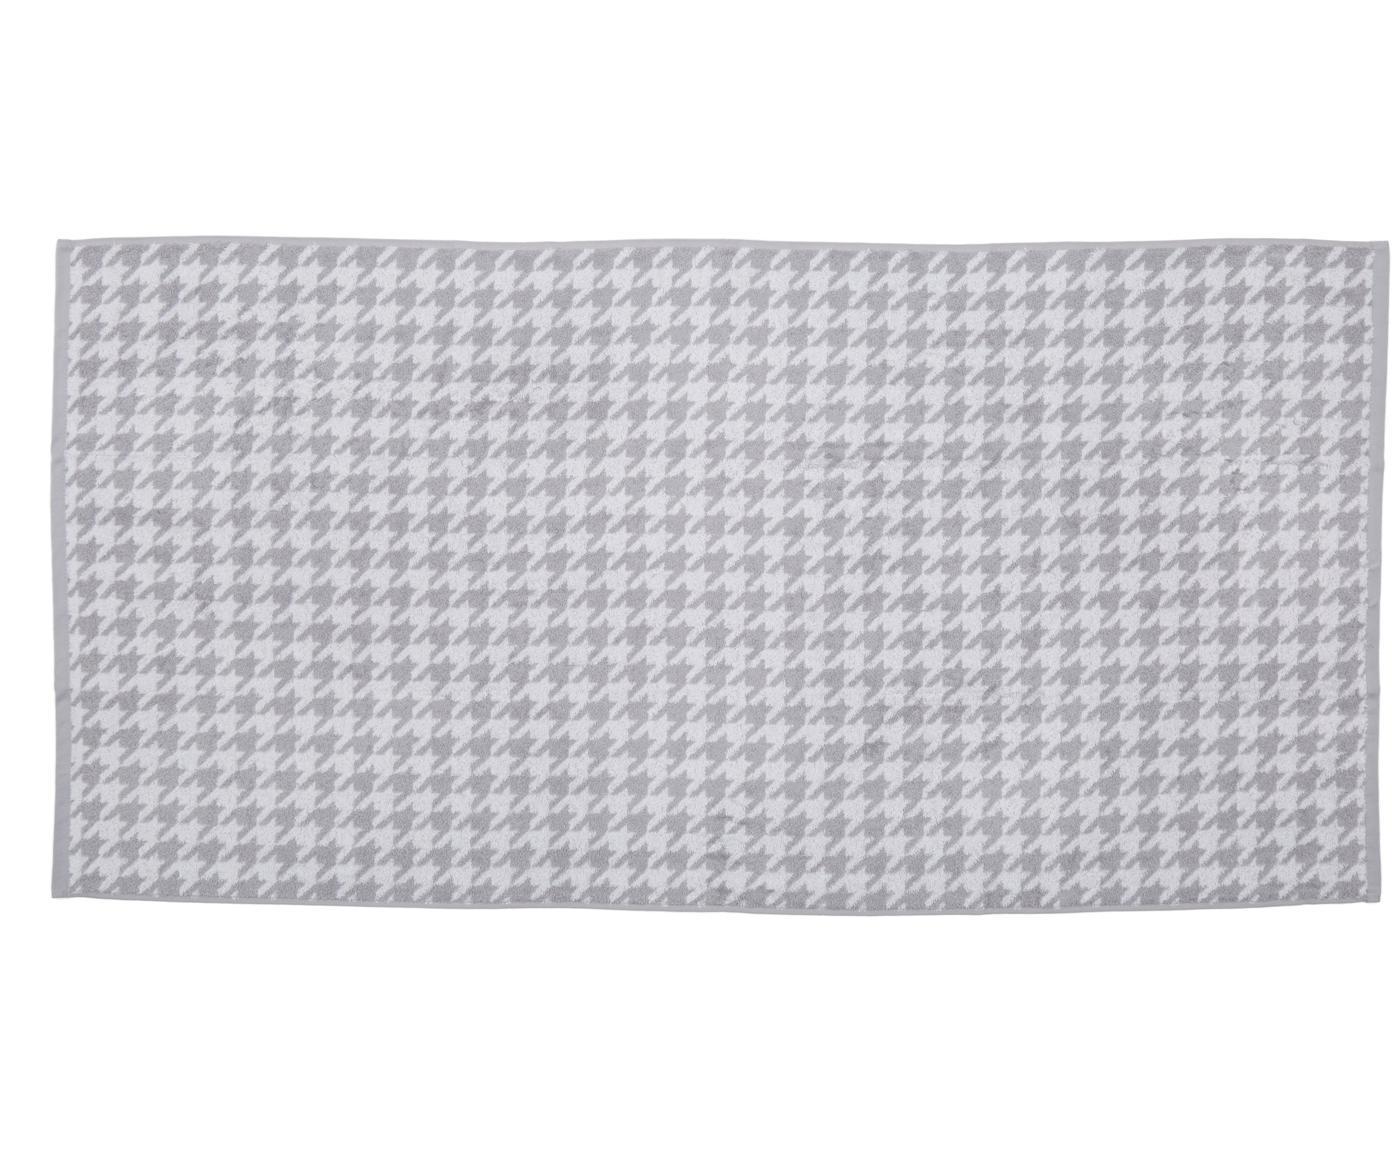 Telo bagno Shapes, Cotone, qualità media 500g/m², Grigio argento, bianco, Larg. 70 x Lung. 140 cm